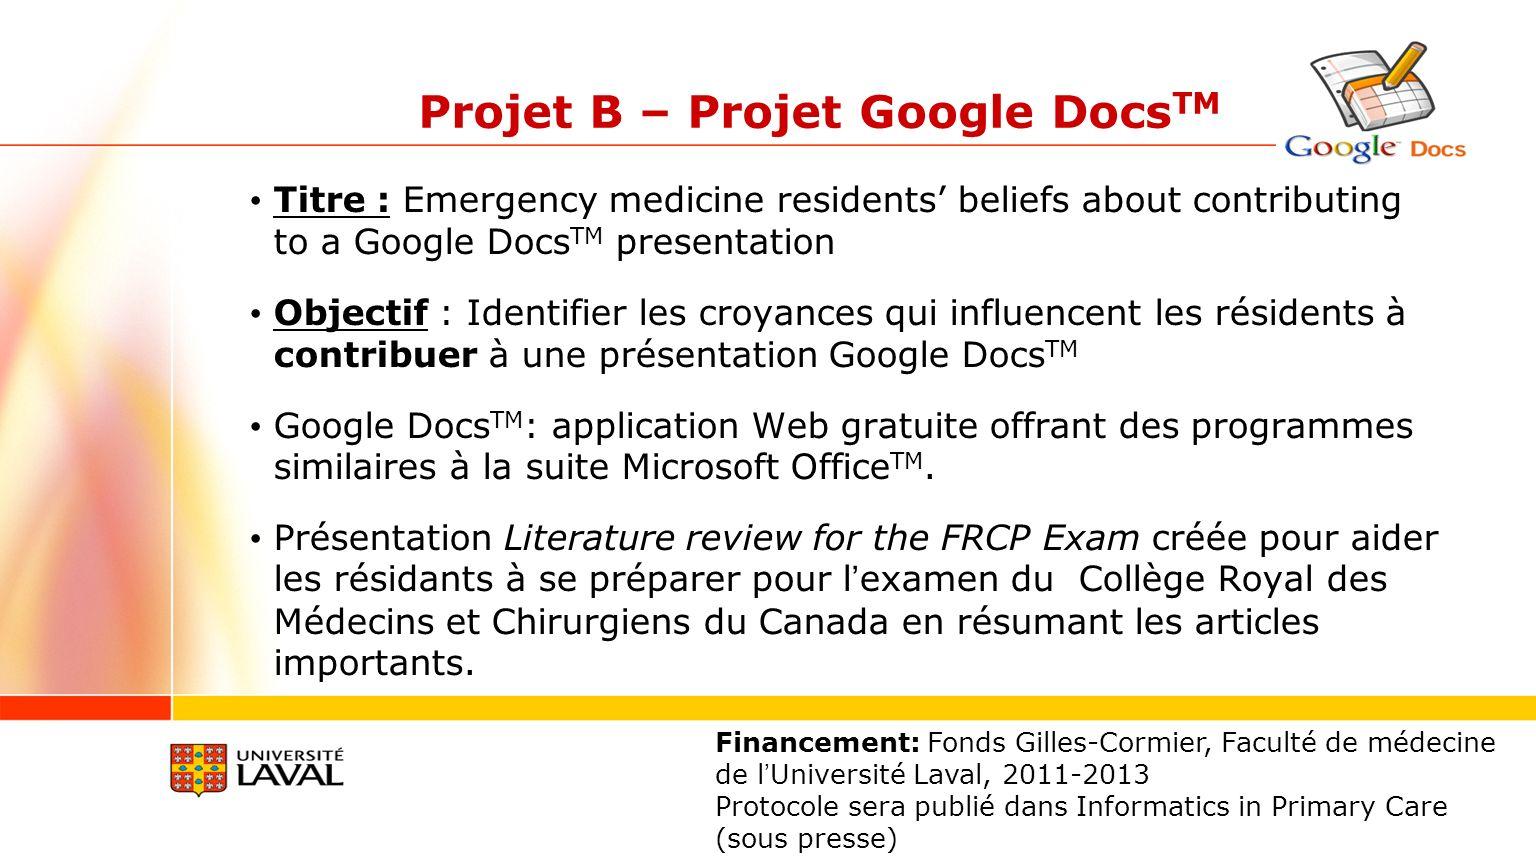 Projet B – Projet Google Docs TM Titre : Emergency medicine residents beliefs about contributing to a Google Docs TM presentation Objectif : Identifie